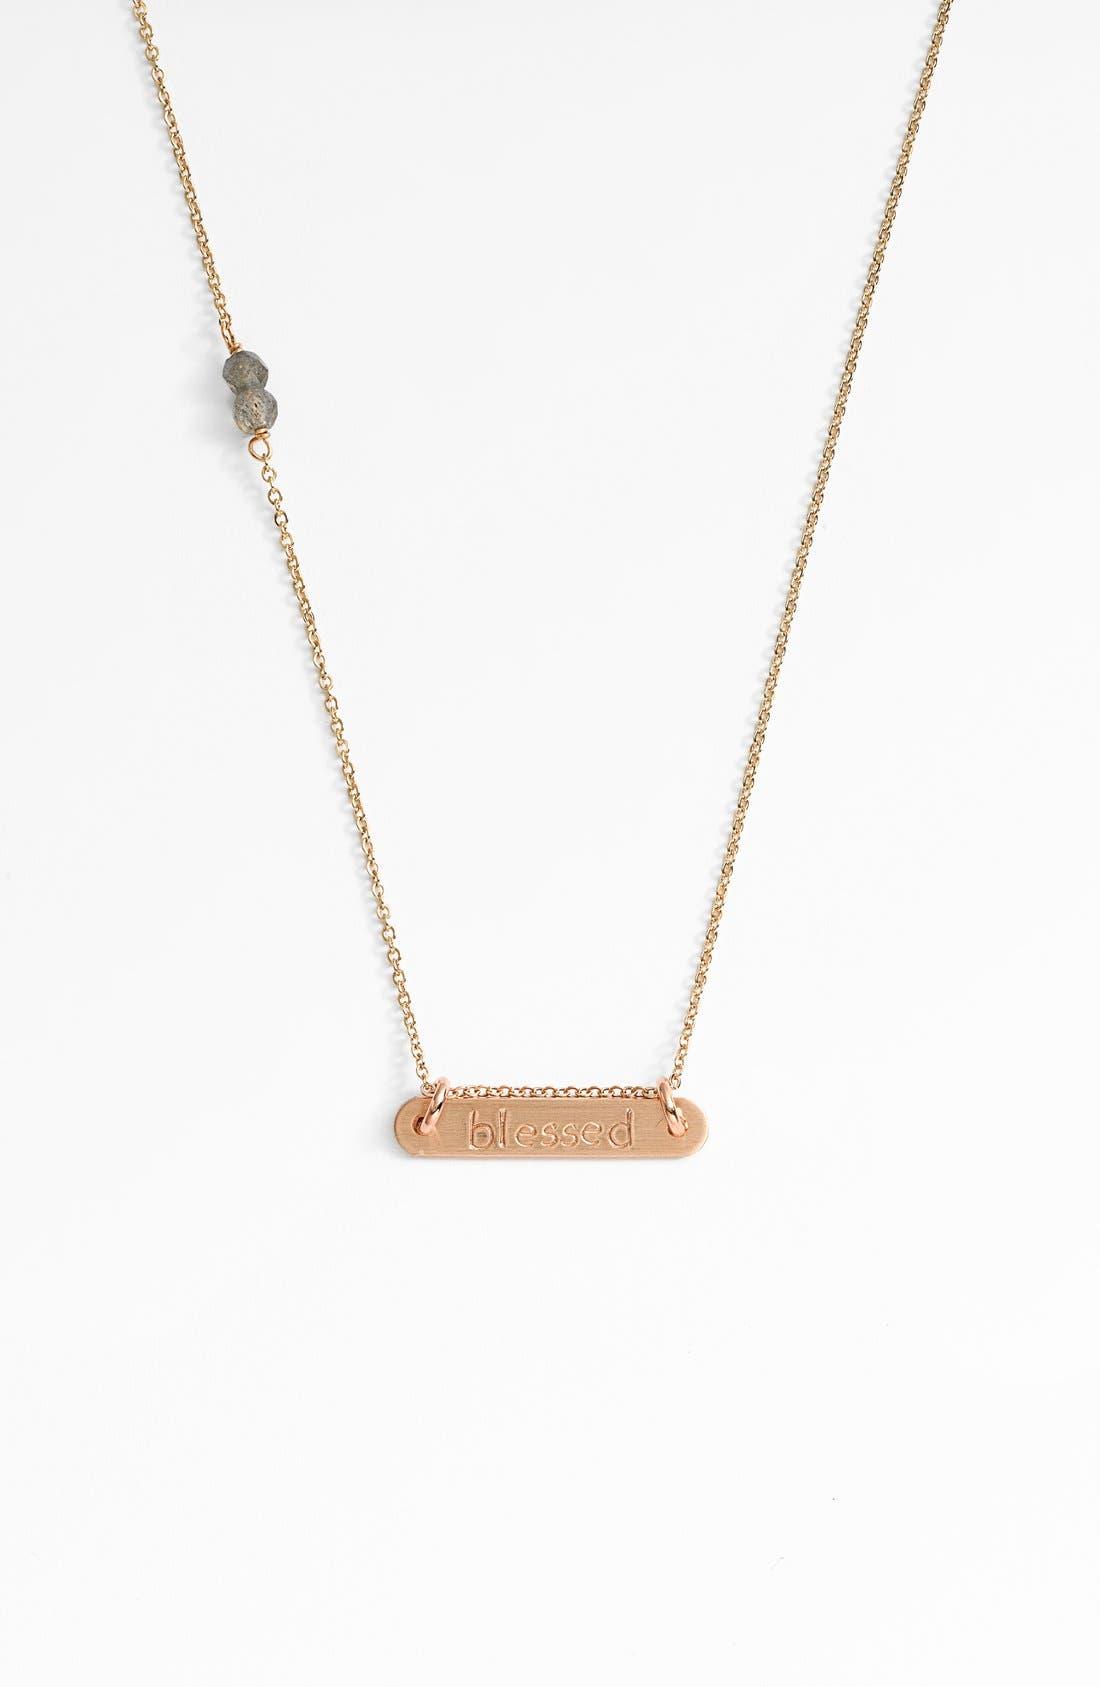 Alternate Image 1 Selected - Nashelle 'Blessed' 14k Gold-Fill Bar Necklace